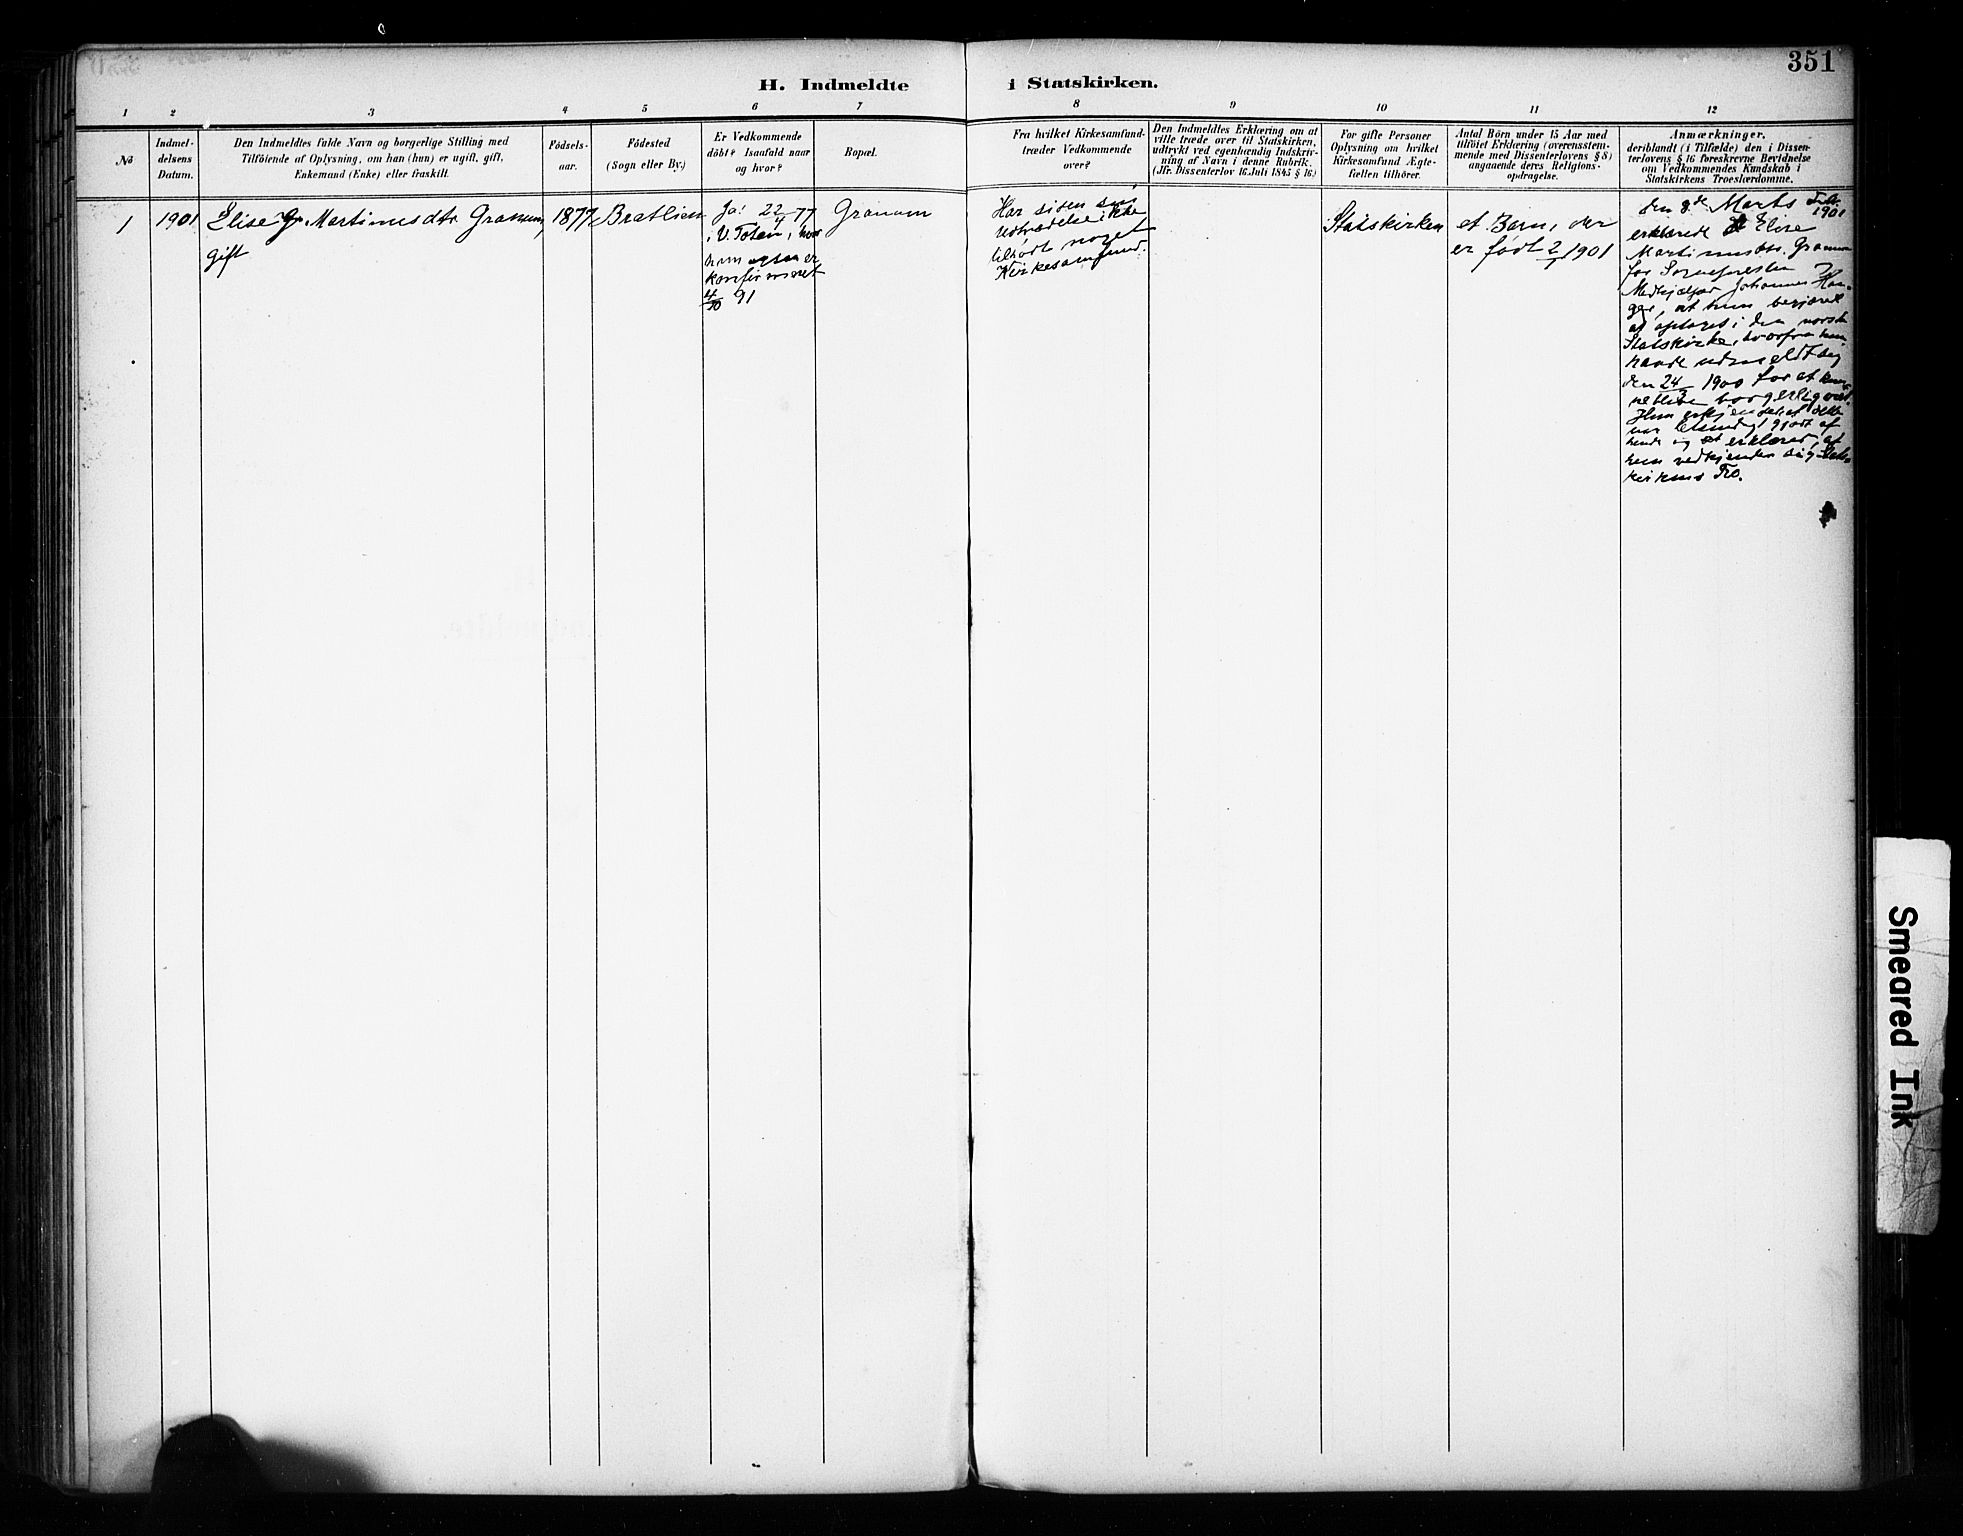 SAH, Vestre Toten prestekontor, H/Ha/Haa/L0011: Ministerialbok nr. 11, 1895-1906, s. 351